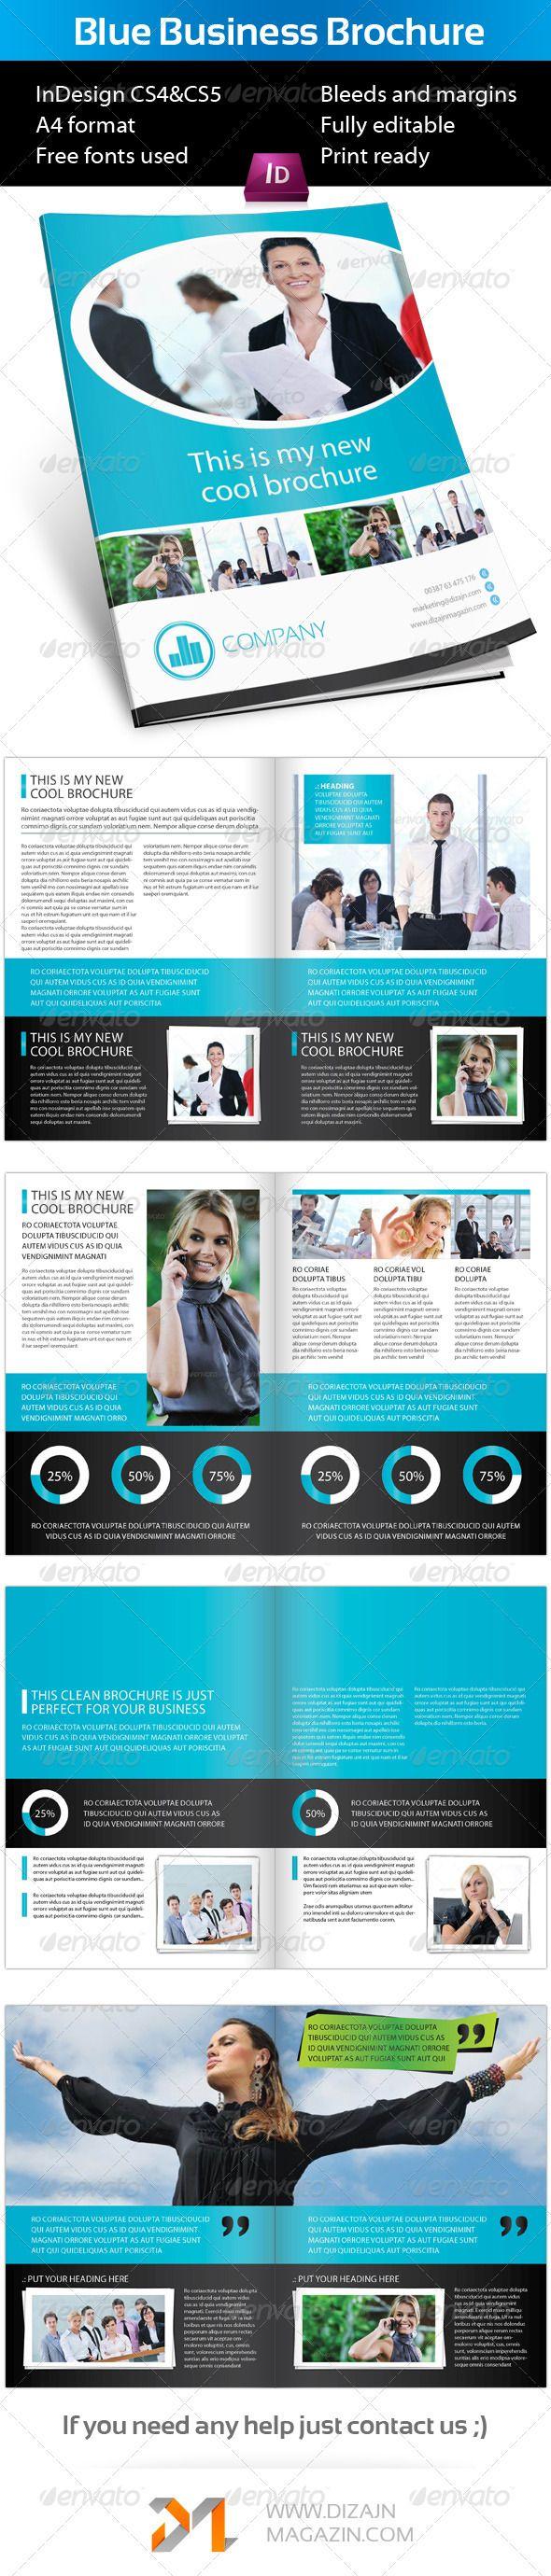 Blue Business Brochure A4 InDesign Template | Diseño editorial ...